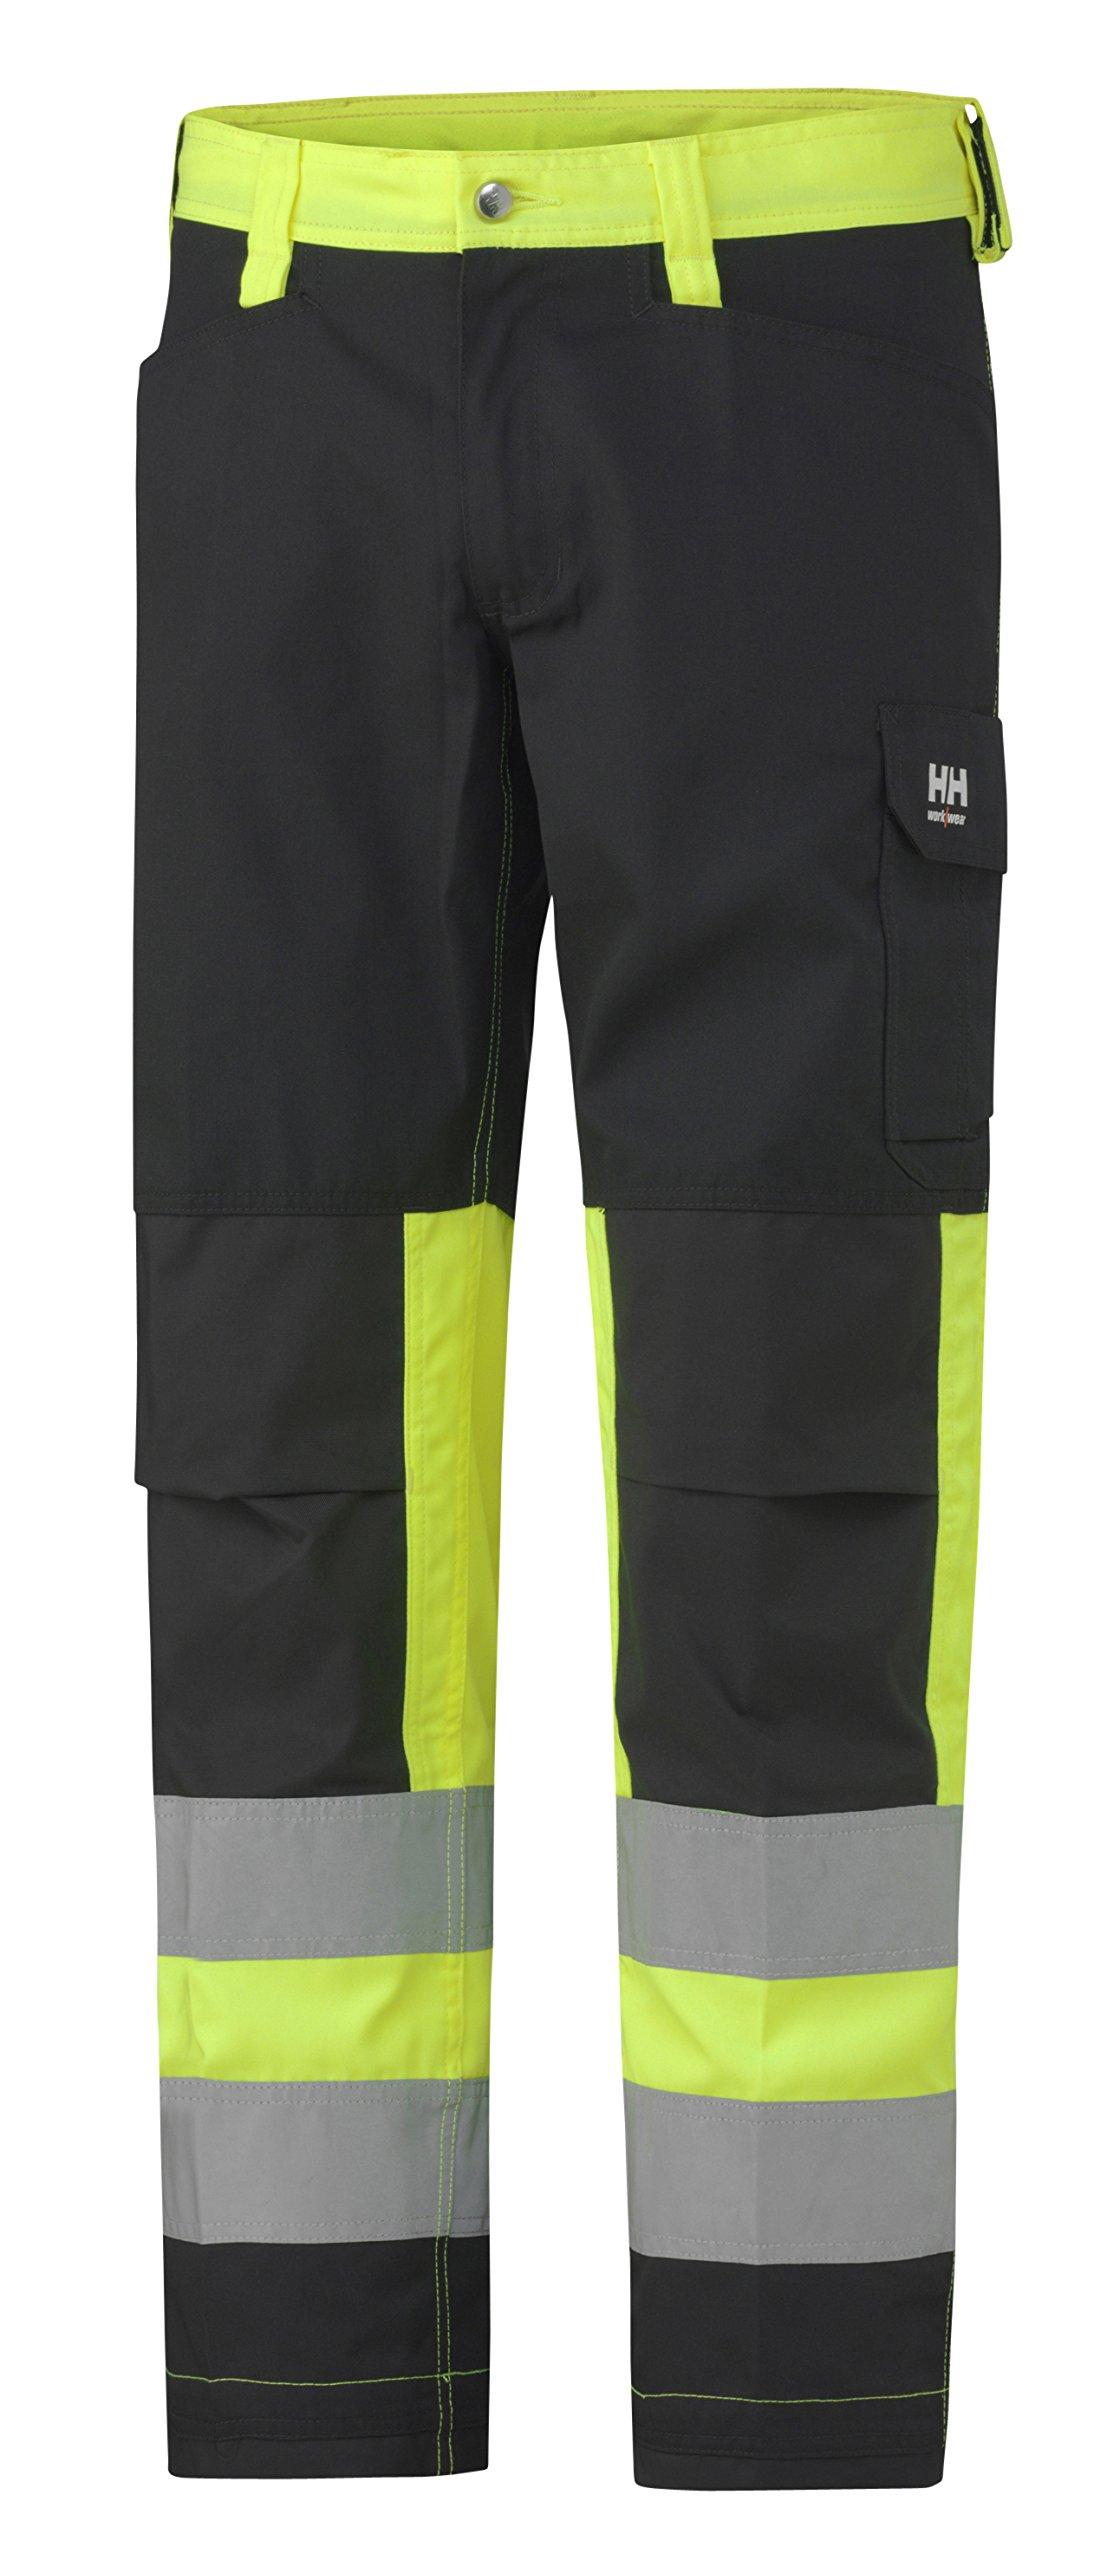 76492_369-C48 Hi-Vis Pants''Alta'' Class 1 Size In C48, Yellow/Charcoal